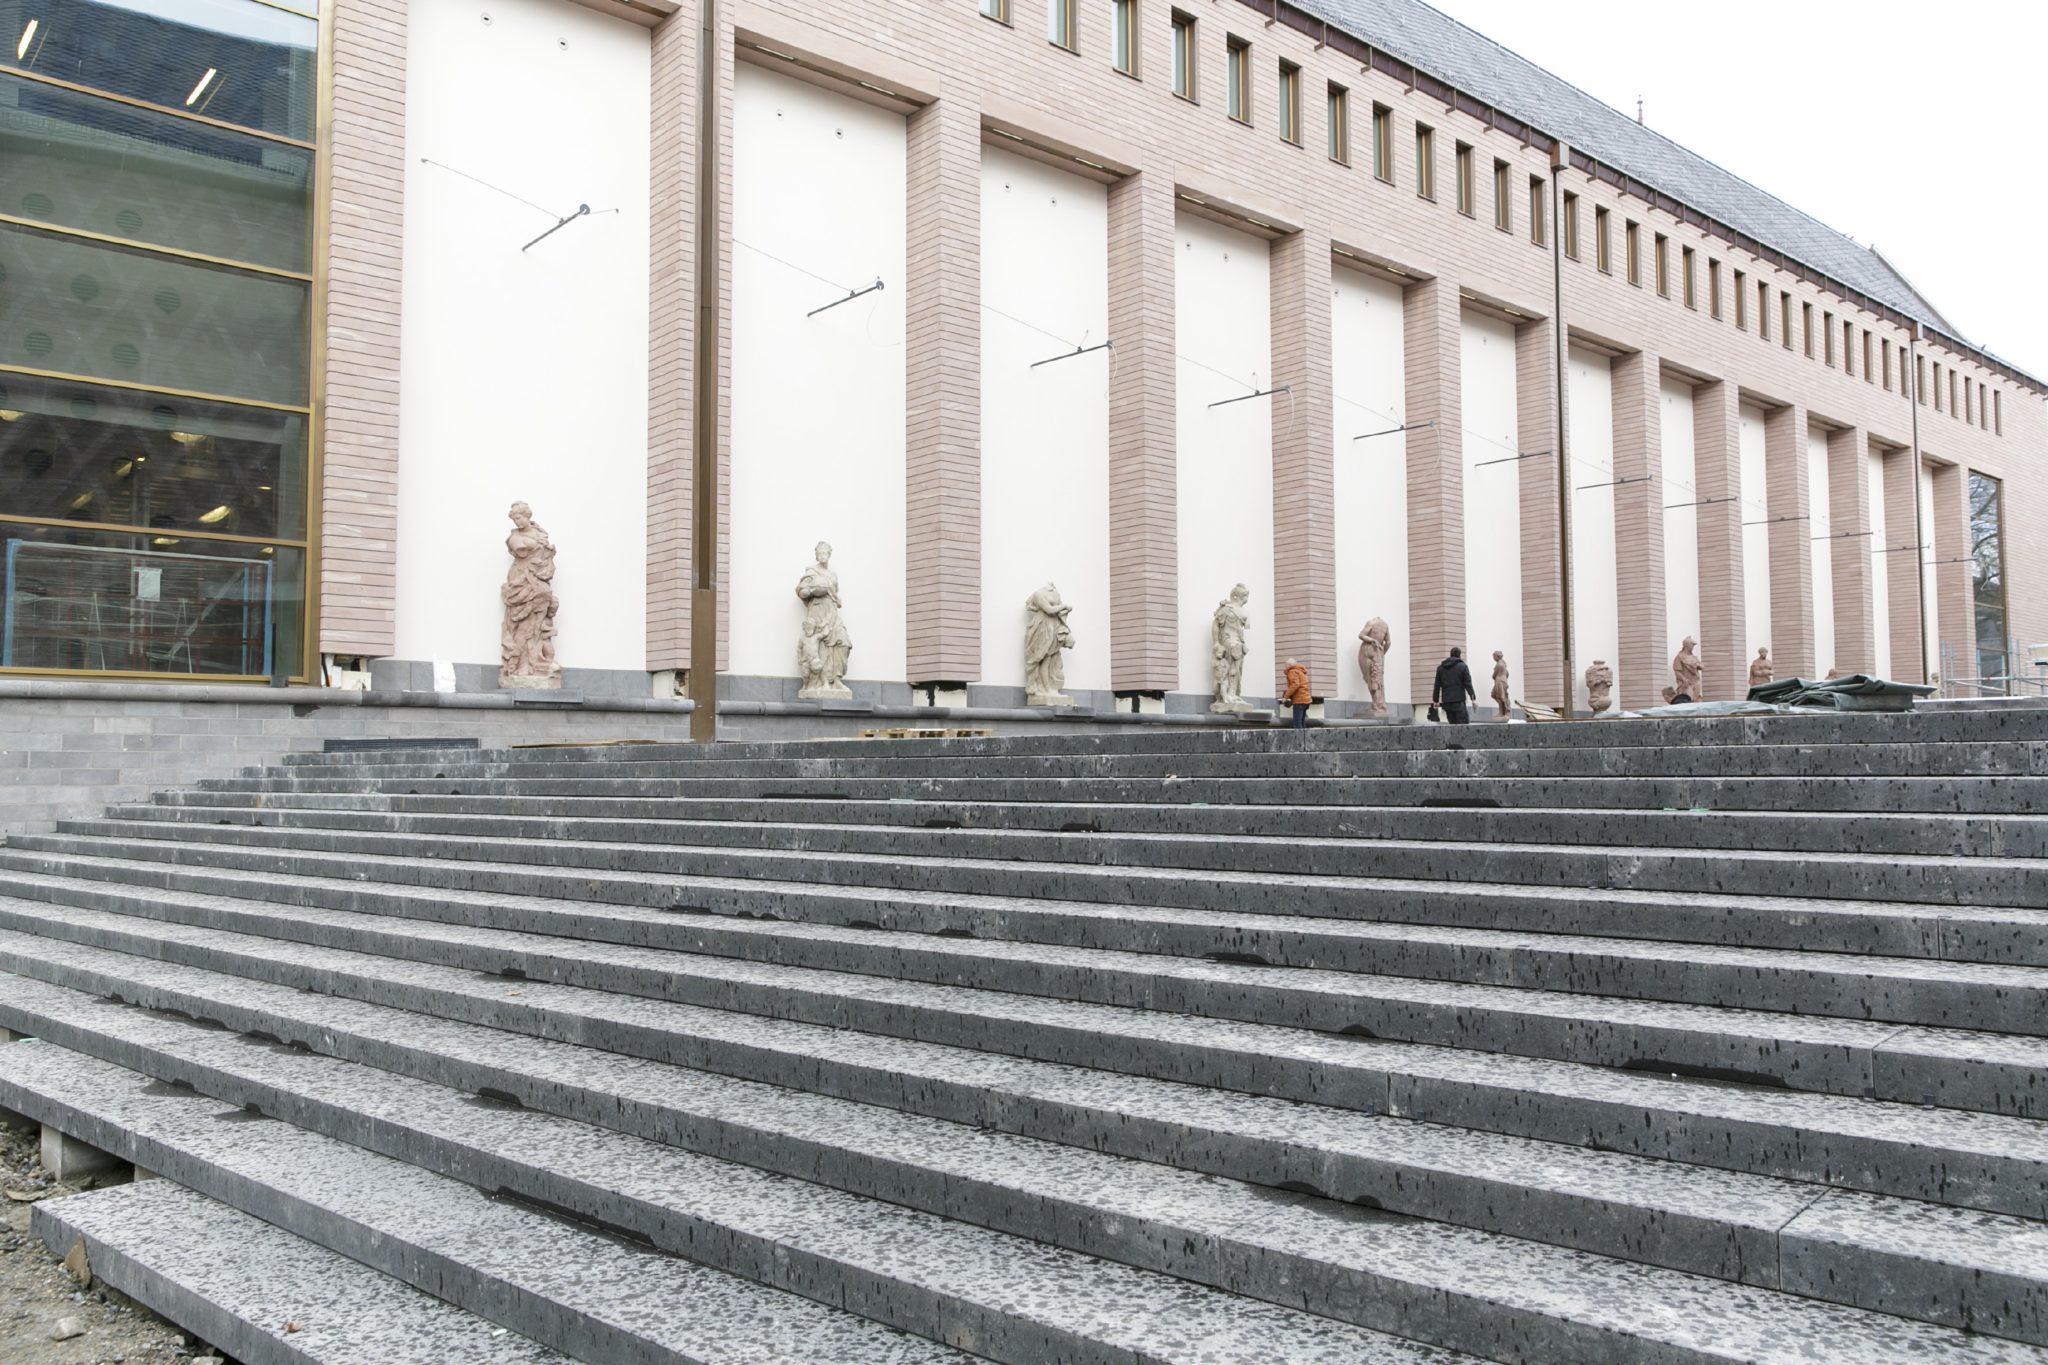 historisches museum frankfurt: Treppe zum Museumsplatz mit Skulpturengalerie im März 2017 © HMf/S.Koesling